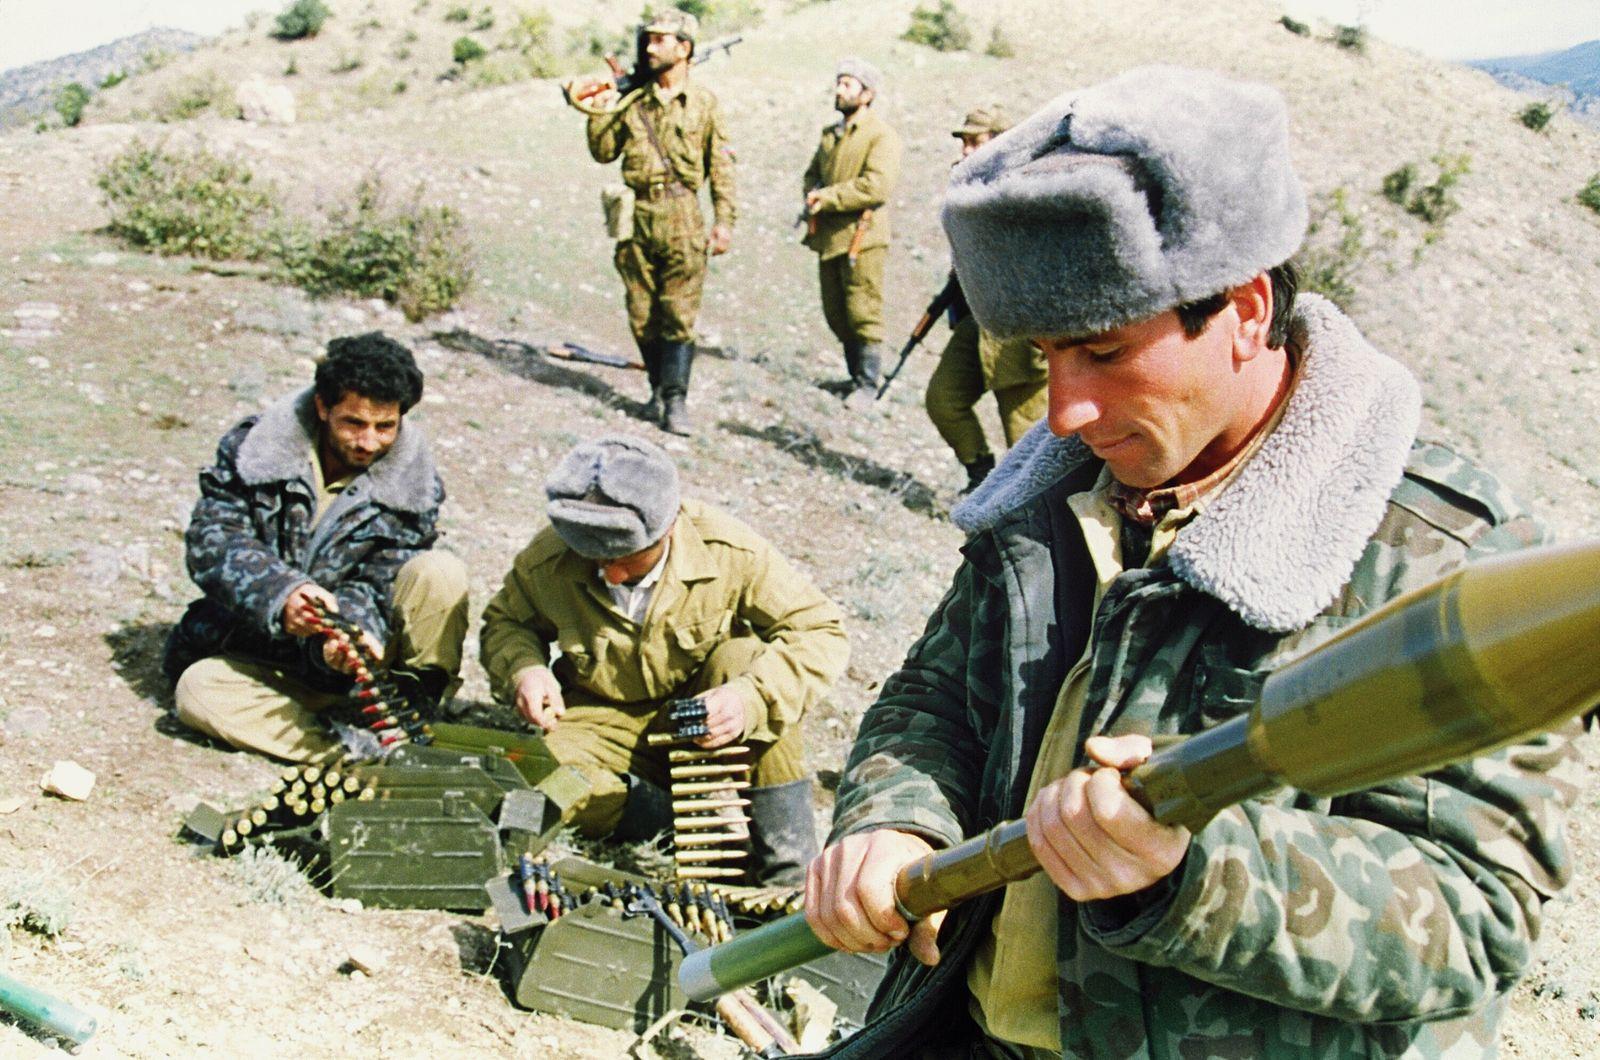 AZERBAIJAN-ARMENIA-ARMY-SOLDIERS